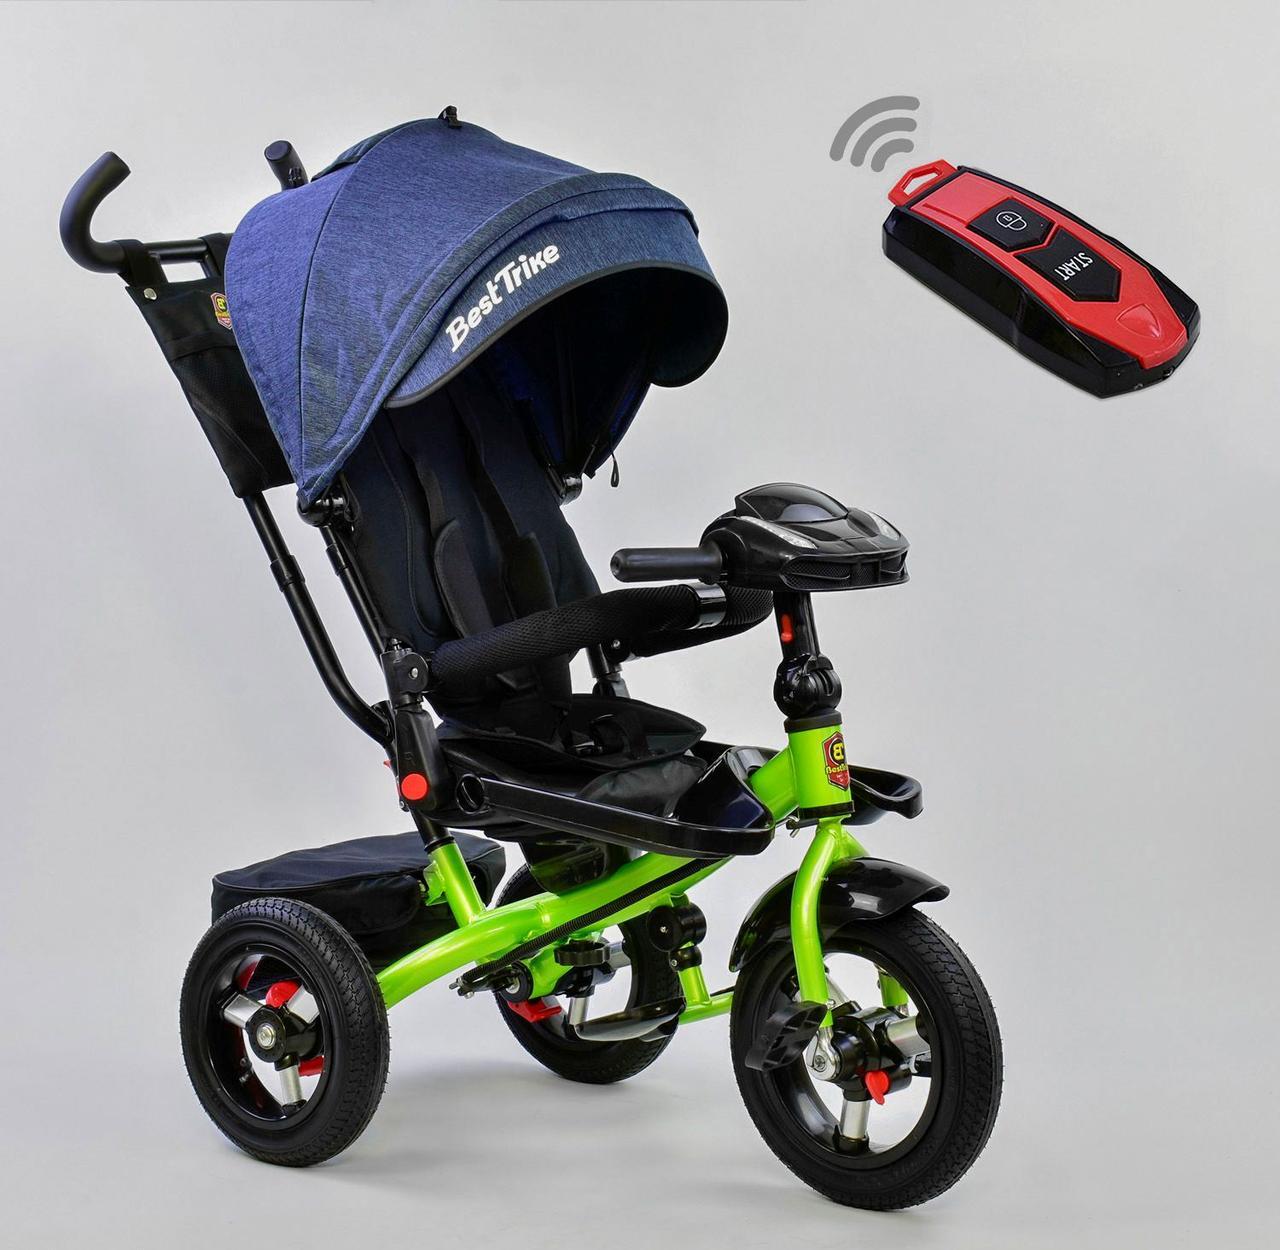 Bелосипед трехколесный Best Trike 6088 F - 1780 с надувными колесами Джинс 75096